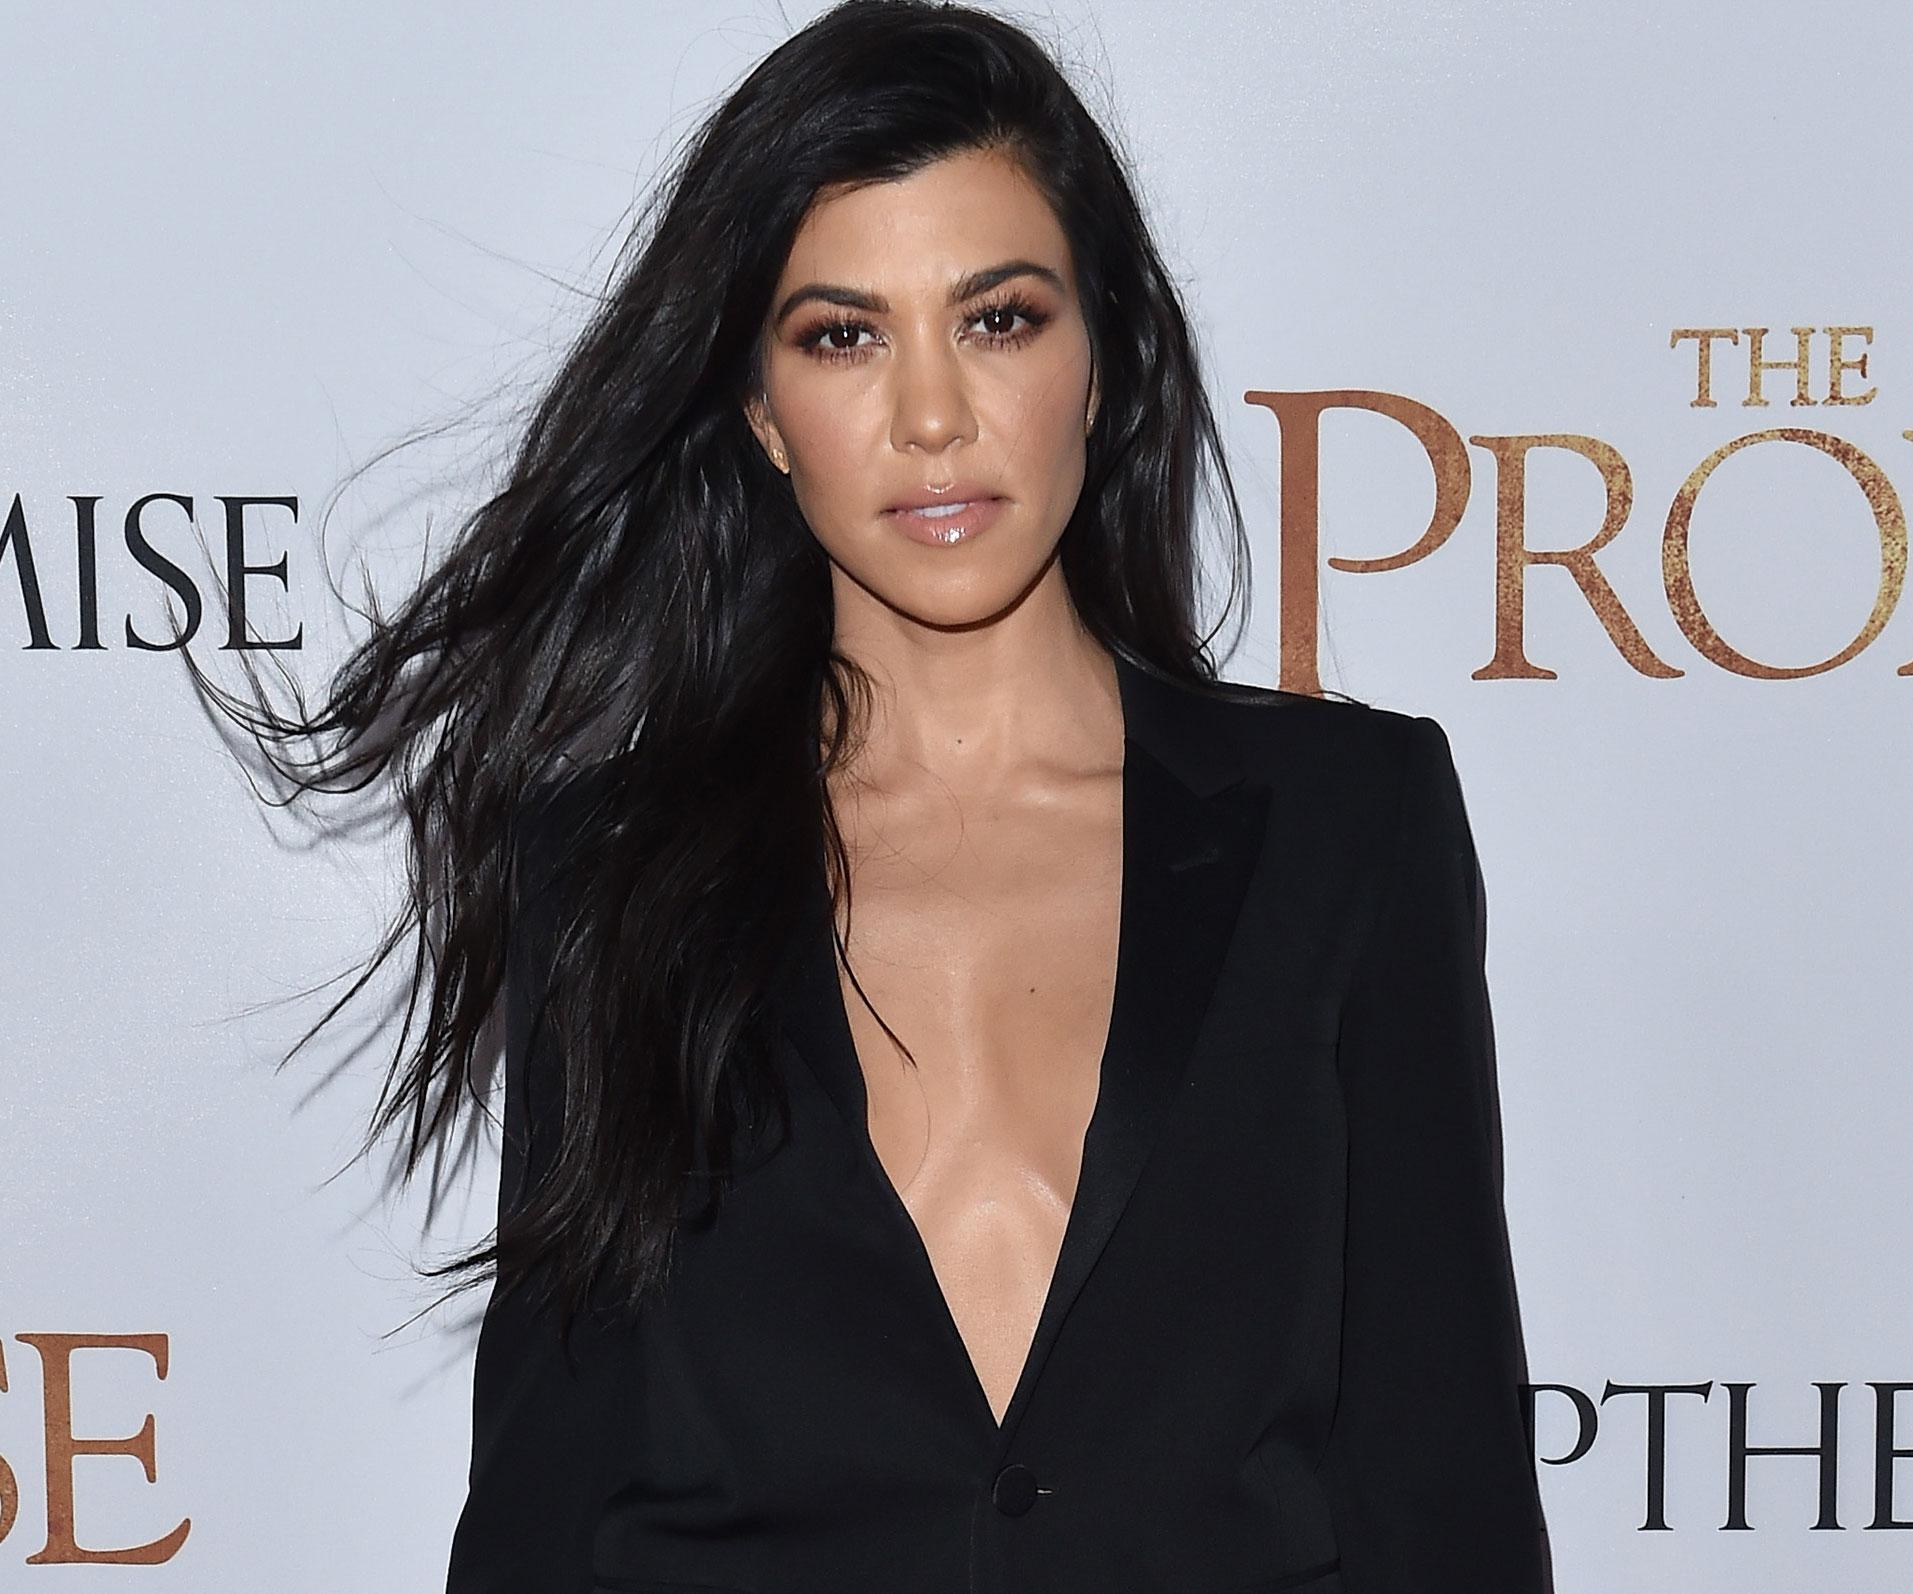 Khloe Kardashian experiences pregnancy complications on new KUWTK episode